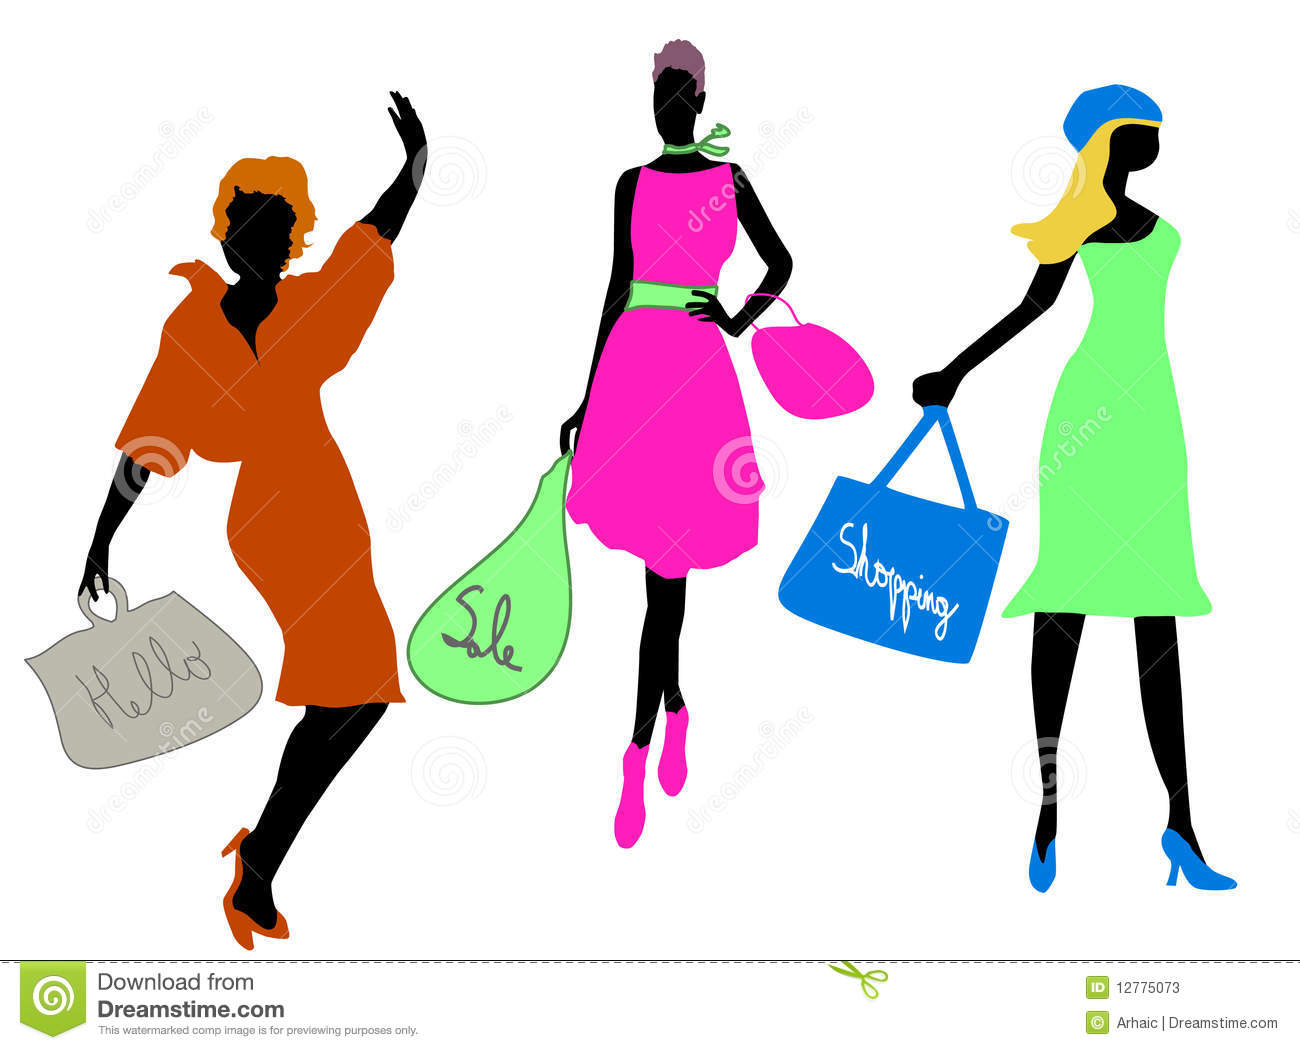 Fashion shopping clipart image free stock Fashion Clipart | Free download best Fashion Clipart on ClipArtMag.com image free stock